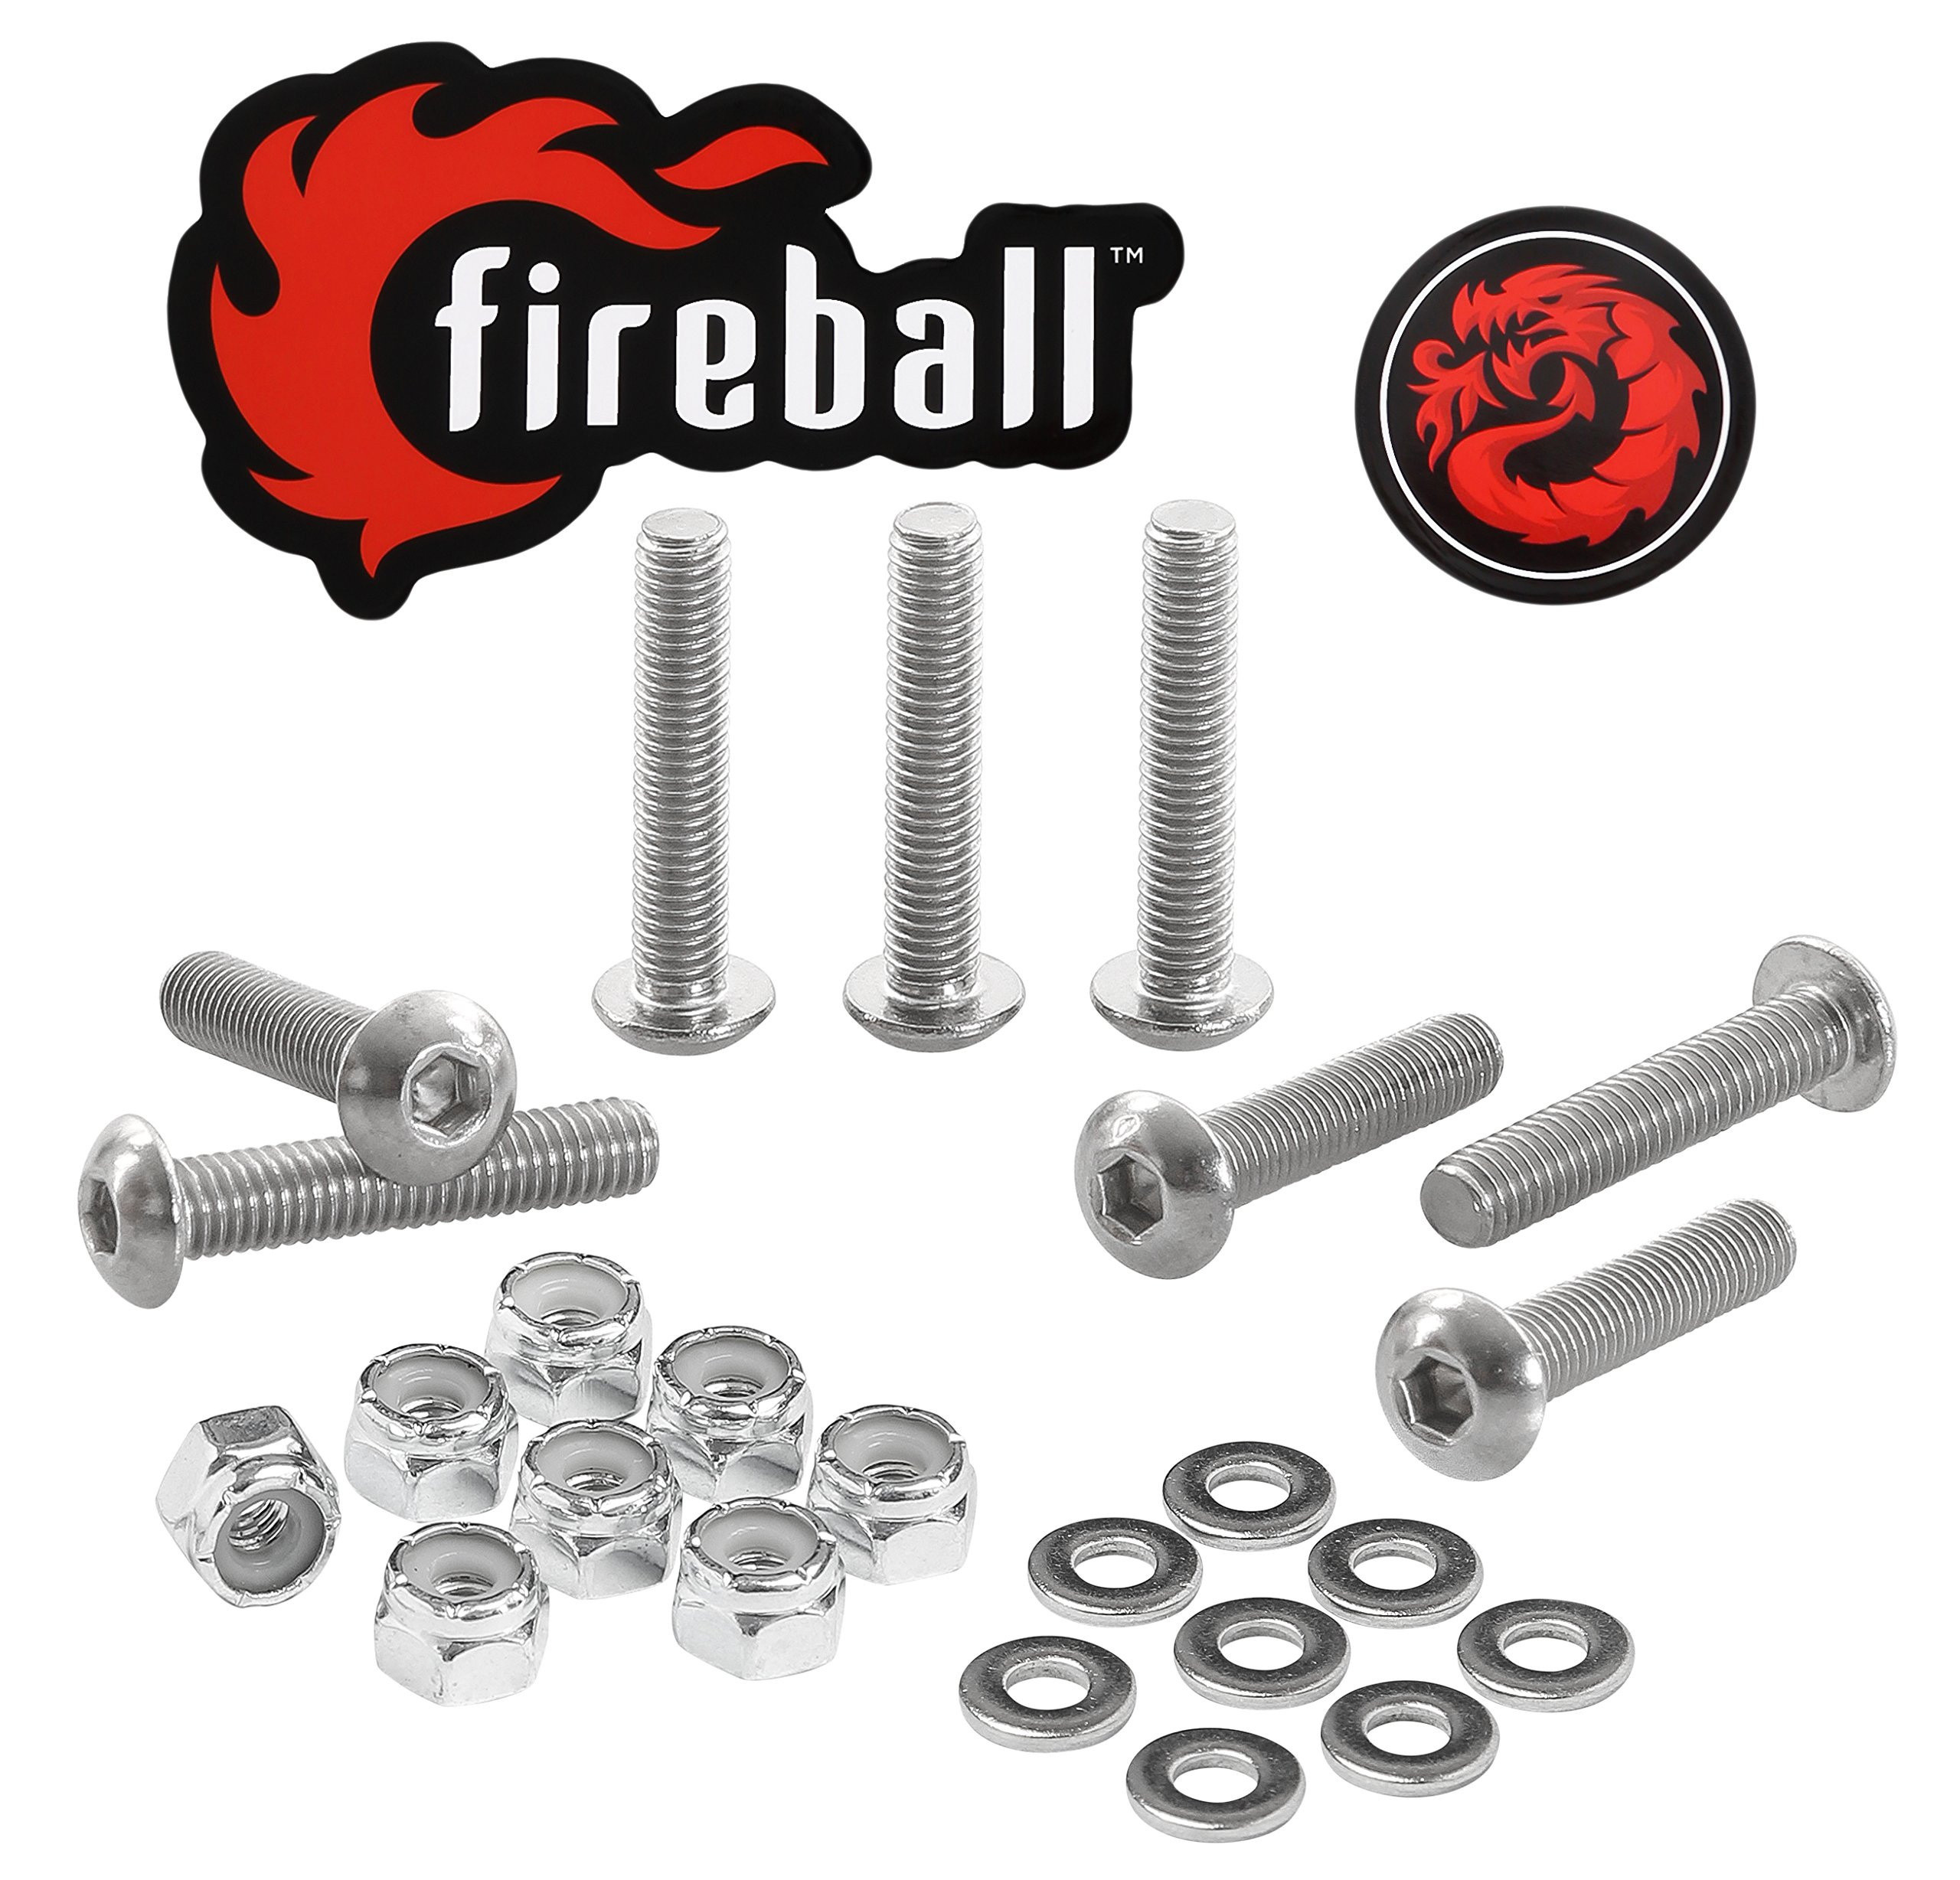 Fireball Dragon Stainless Steel Skateboard Hardware Set (Button Allen, 1.0'')